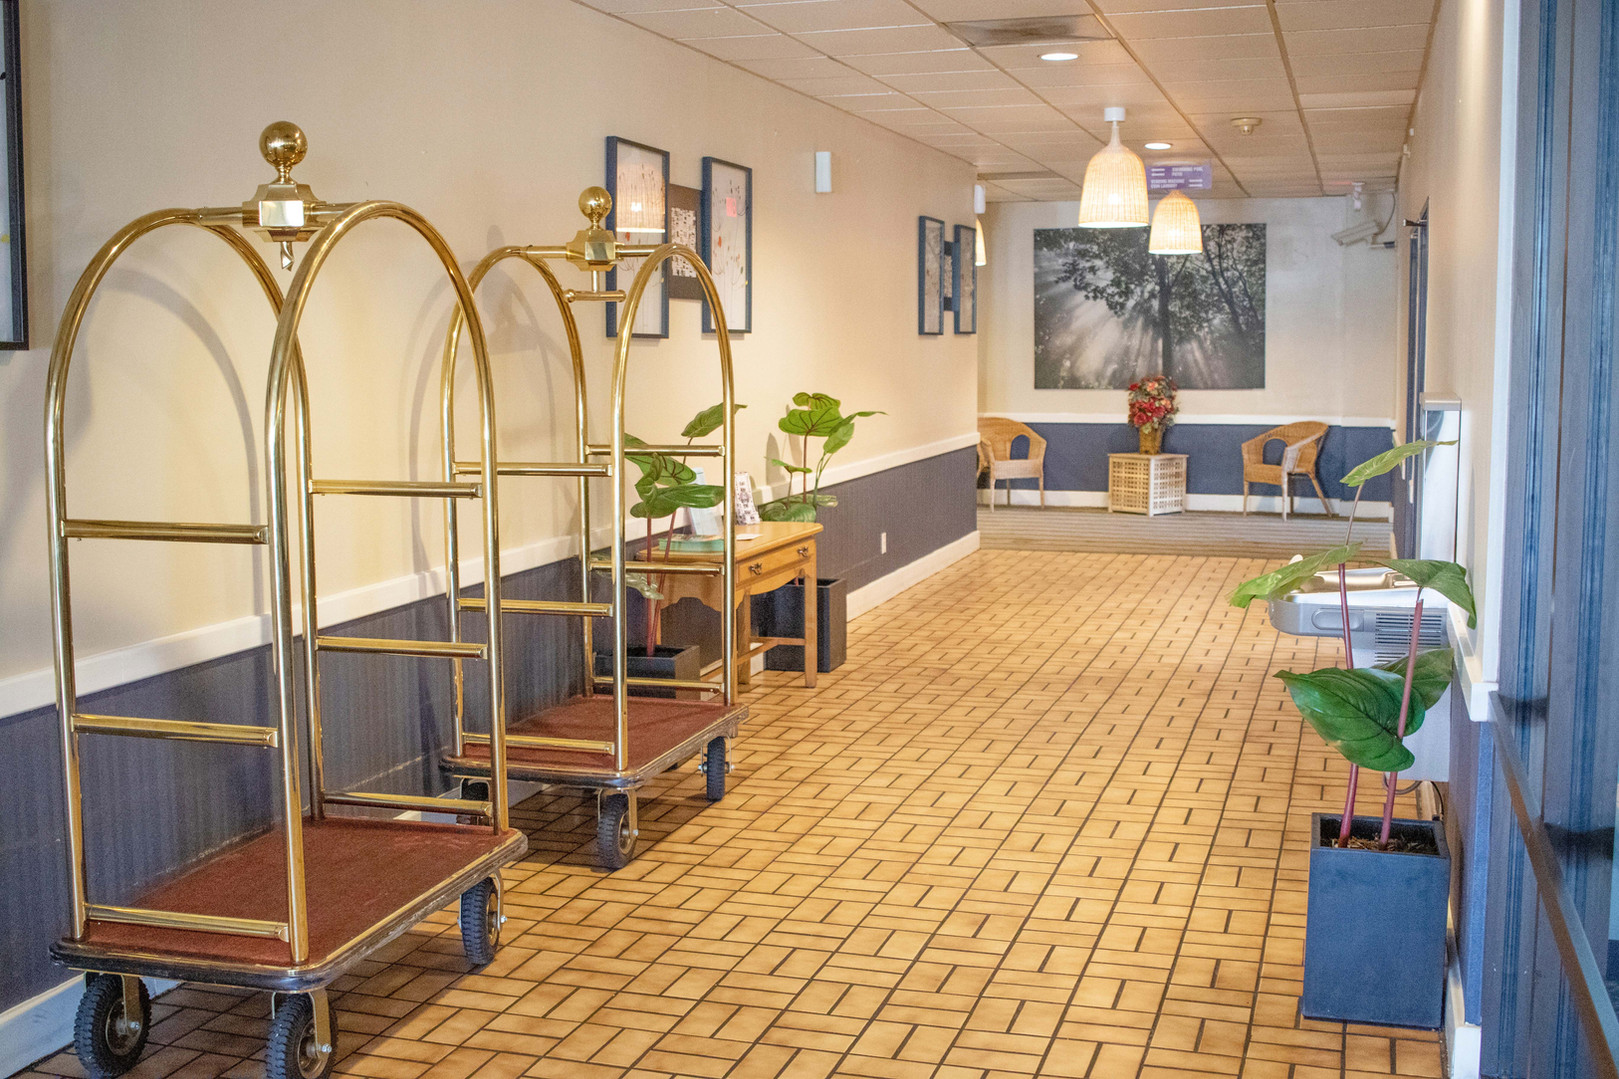 Lobby Hallway